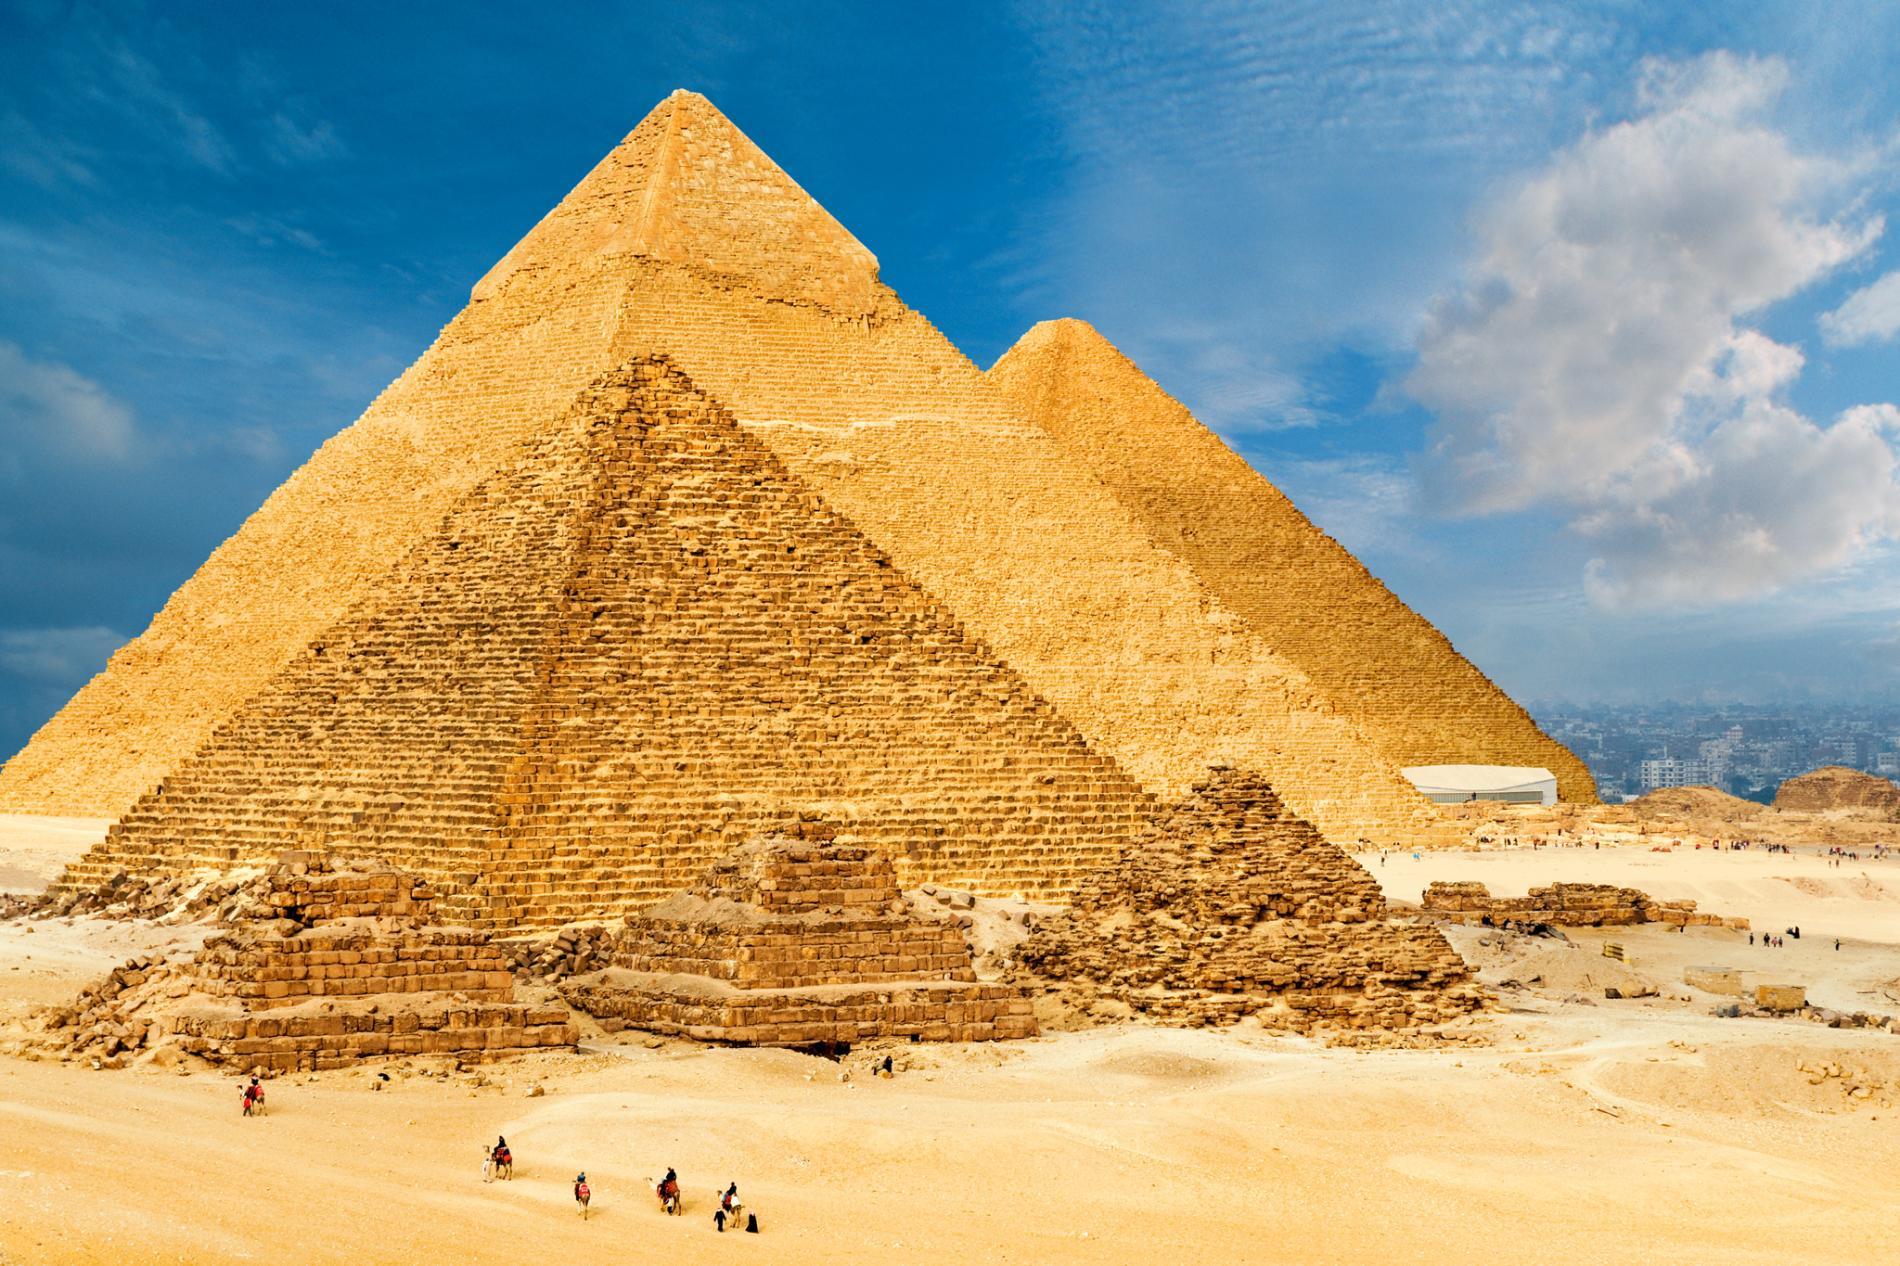 Drawn pyramid basic Tall: Great  Egypt's Pyramids